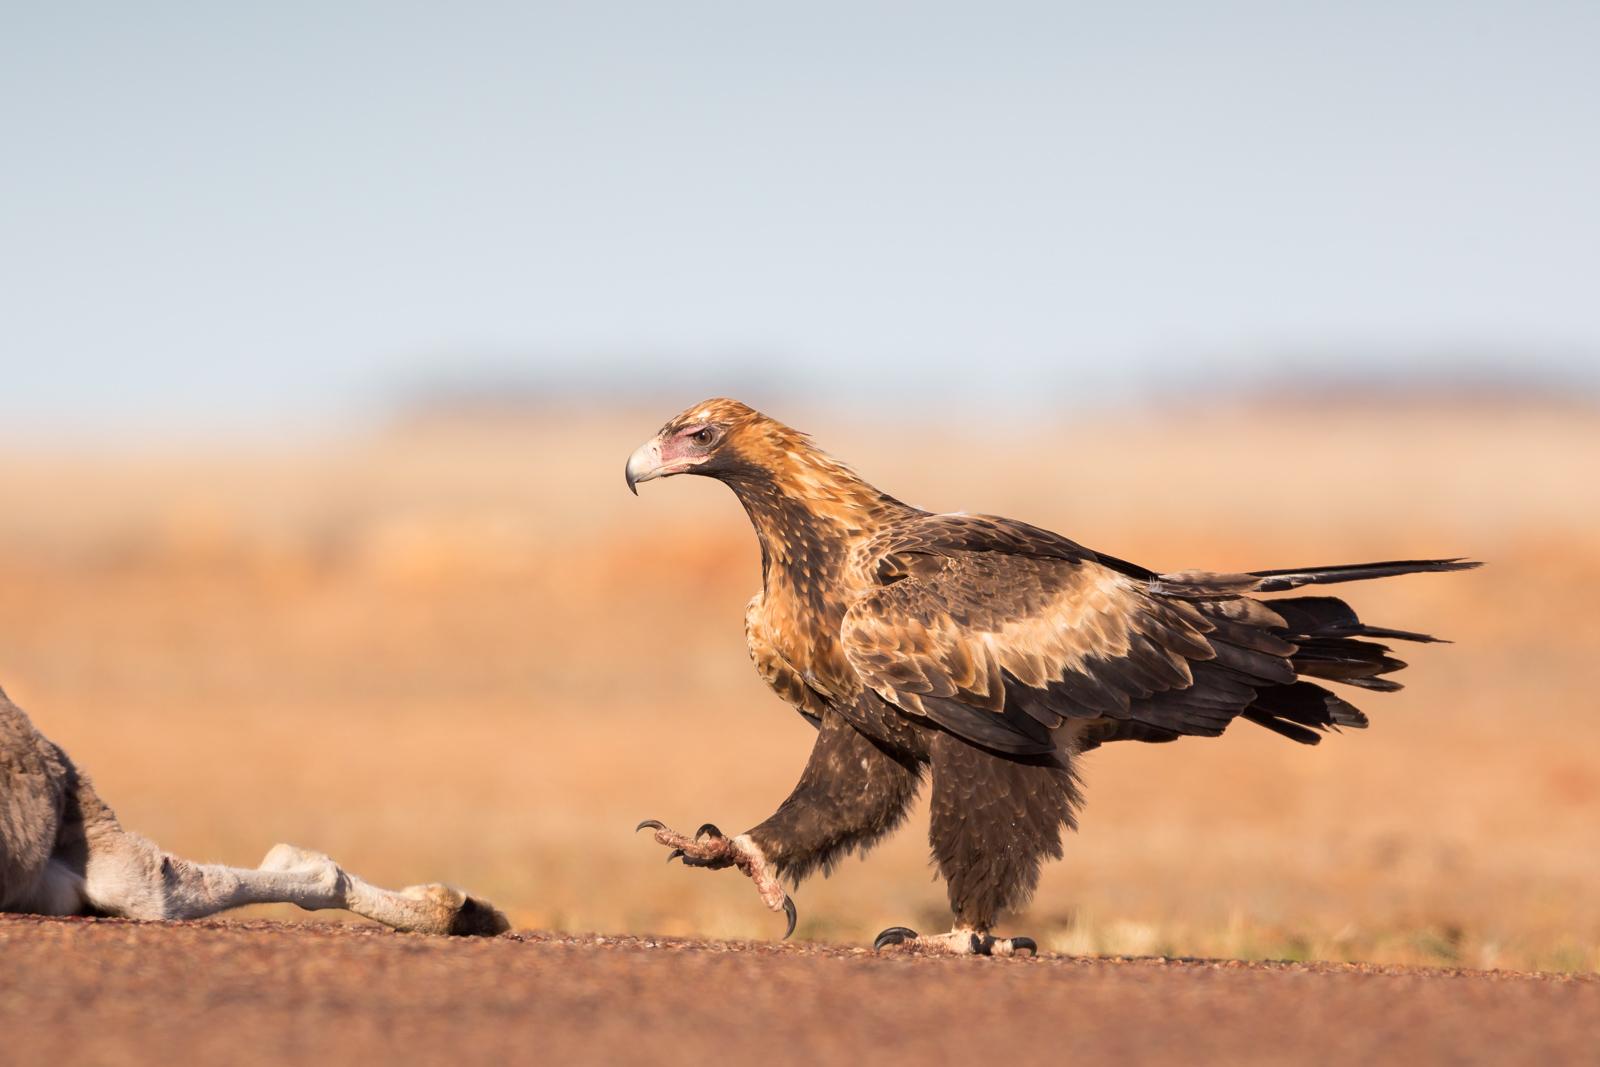 Wedge-tailed Eagle_David Stowe-3330.jpg